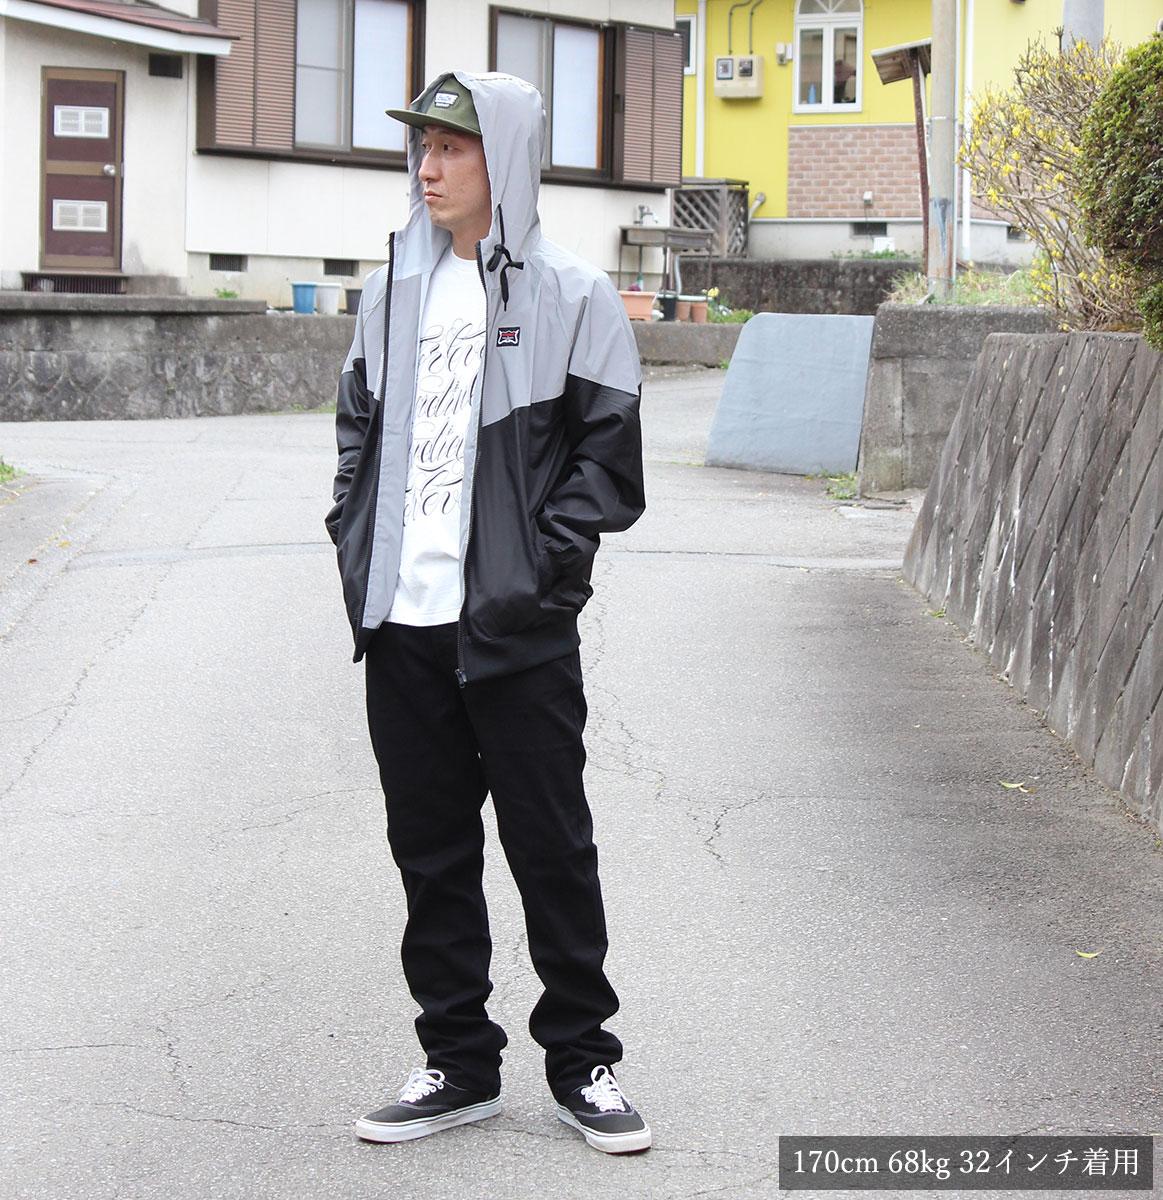 ALTAMONT(arutamonto)A/979 DENIM(BLACK)BAKER SKATEBOARDS HEROIN SKATEBOADS黑色牛仔裤标准合身锥形街道服装服饰名牌